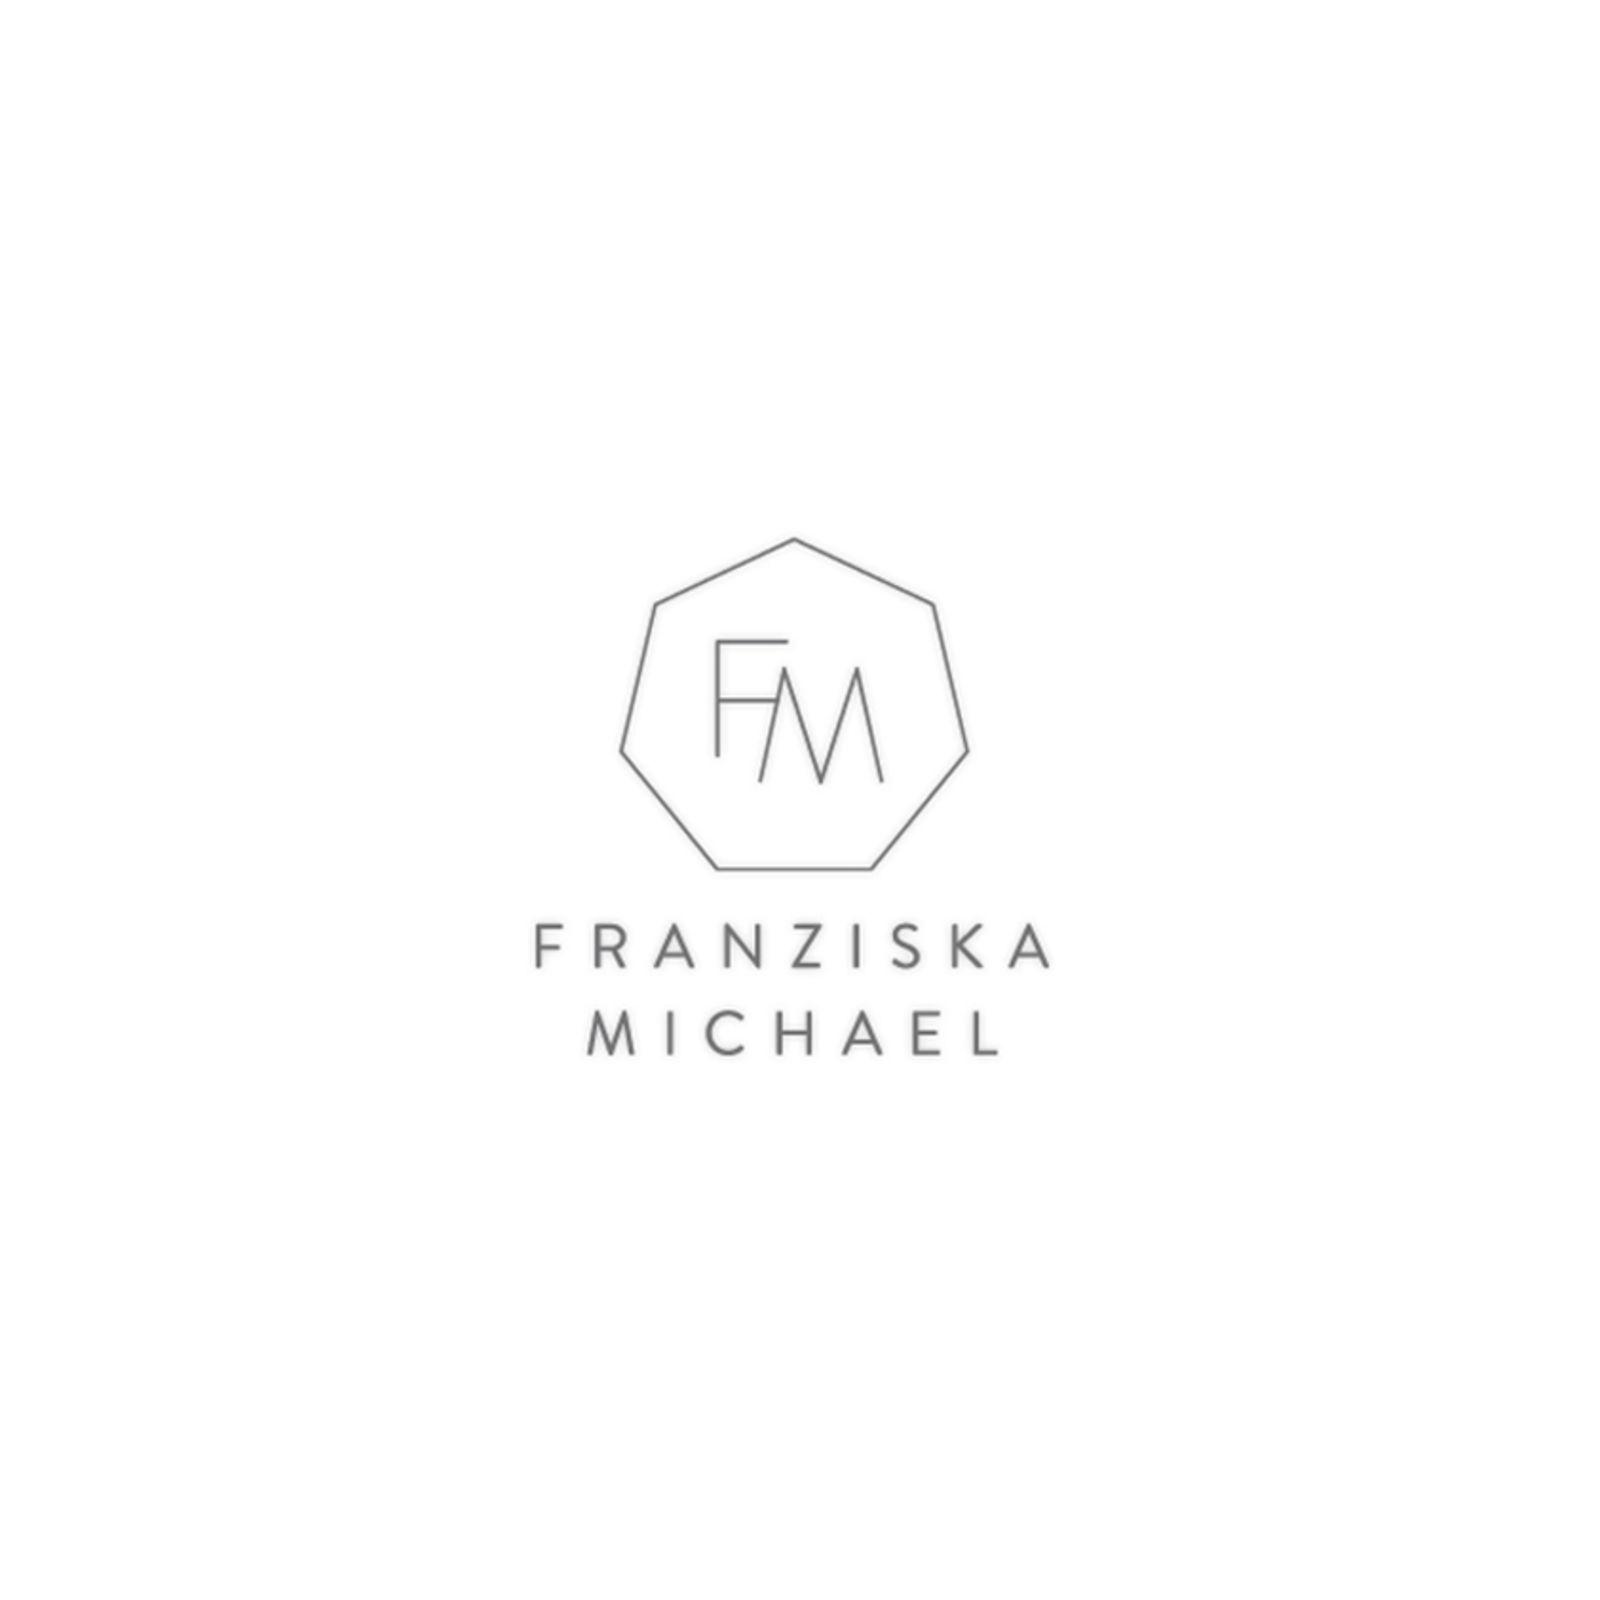 FRANZISKA MICHAEL